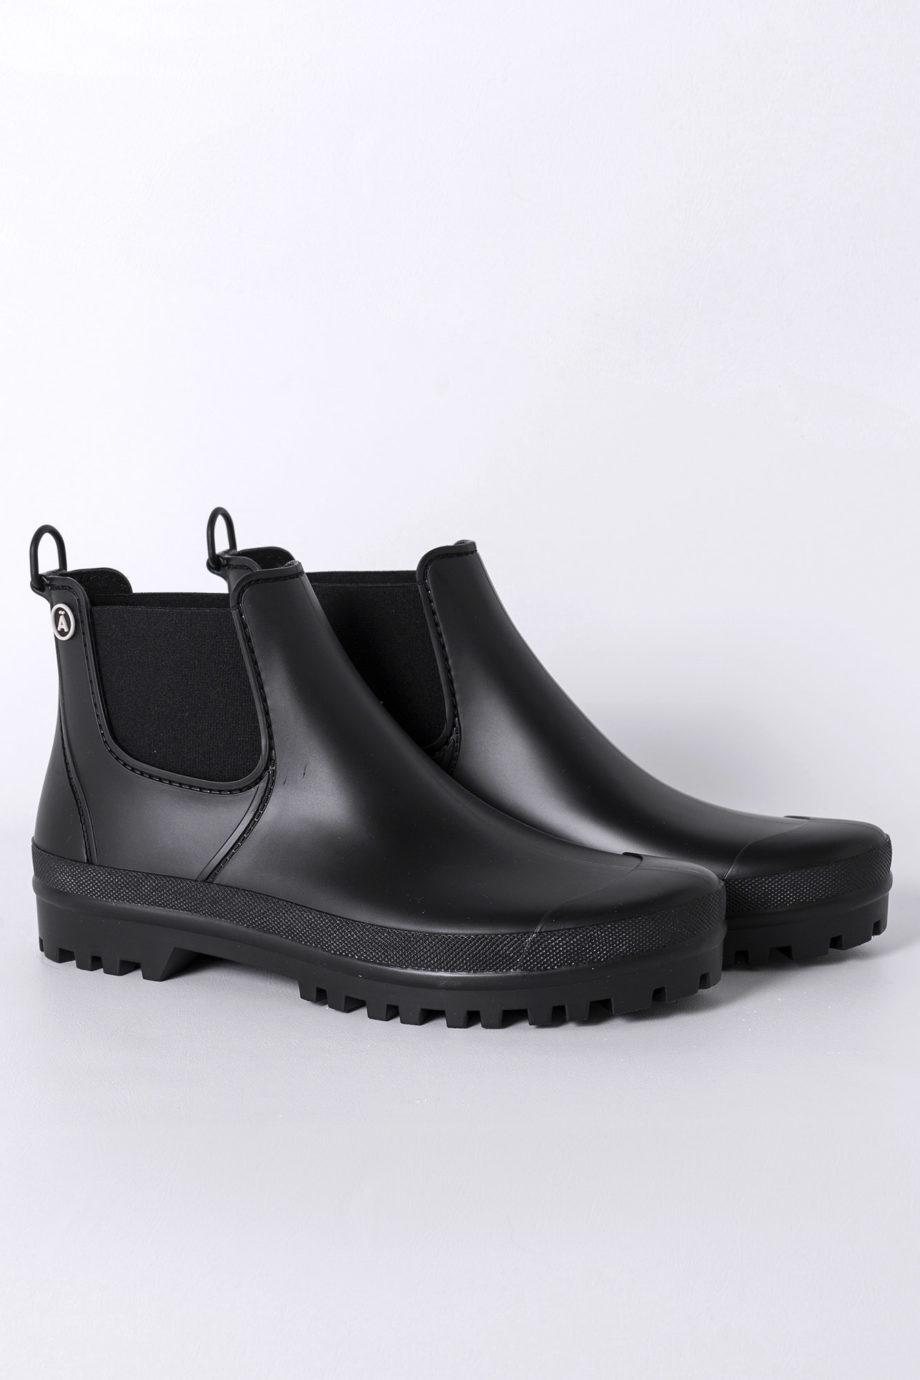 botas-de-agua-kropla-black